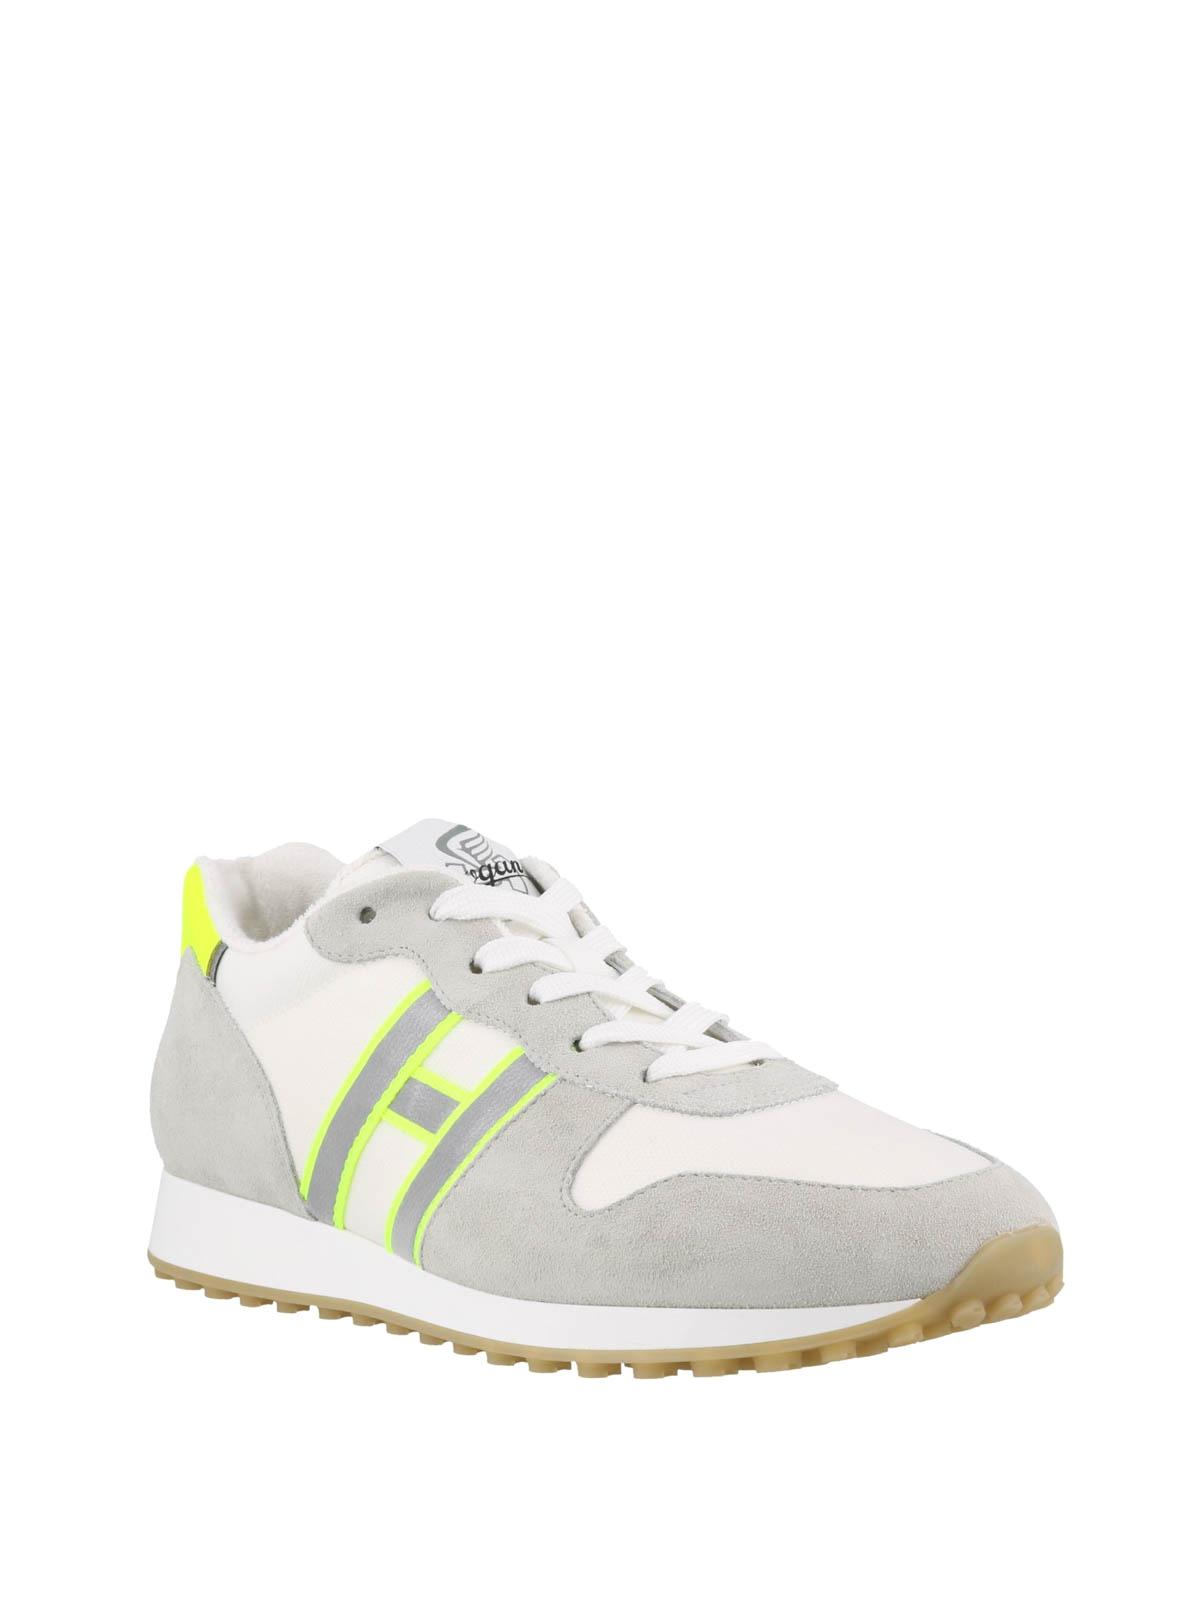 Hogan Sneaker H383 grigio chiaro in camoscio sneakers